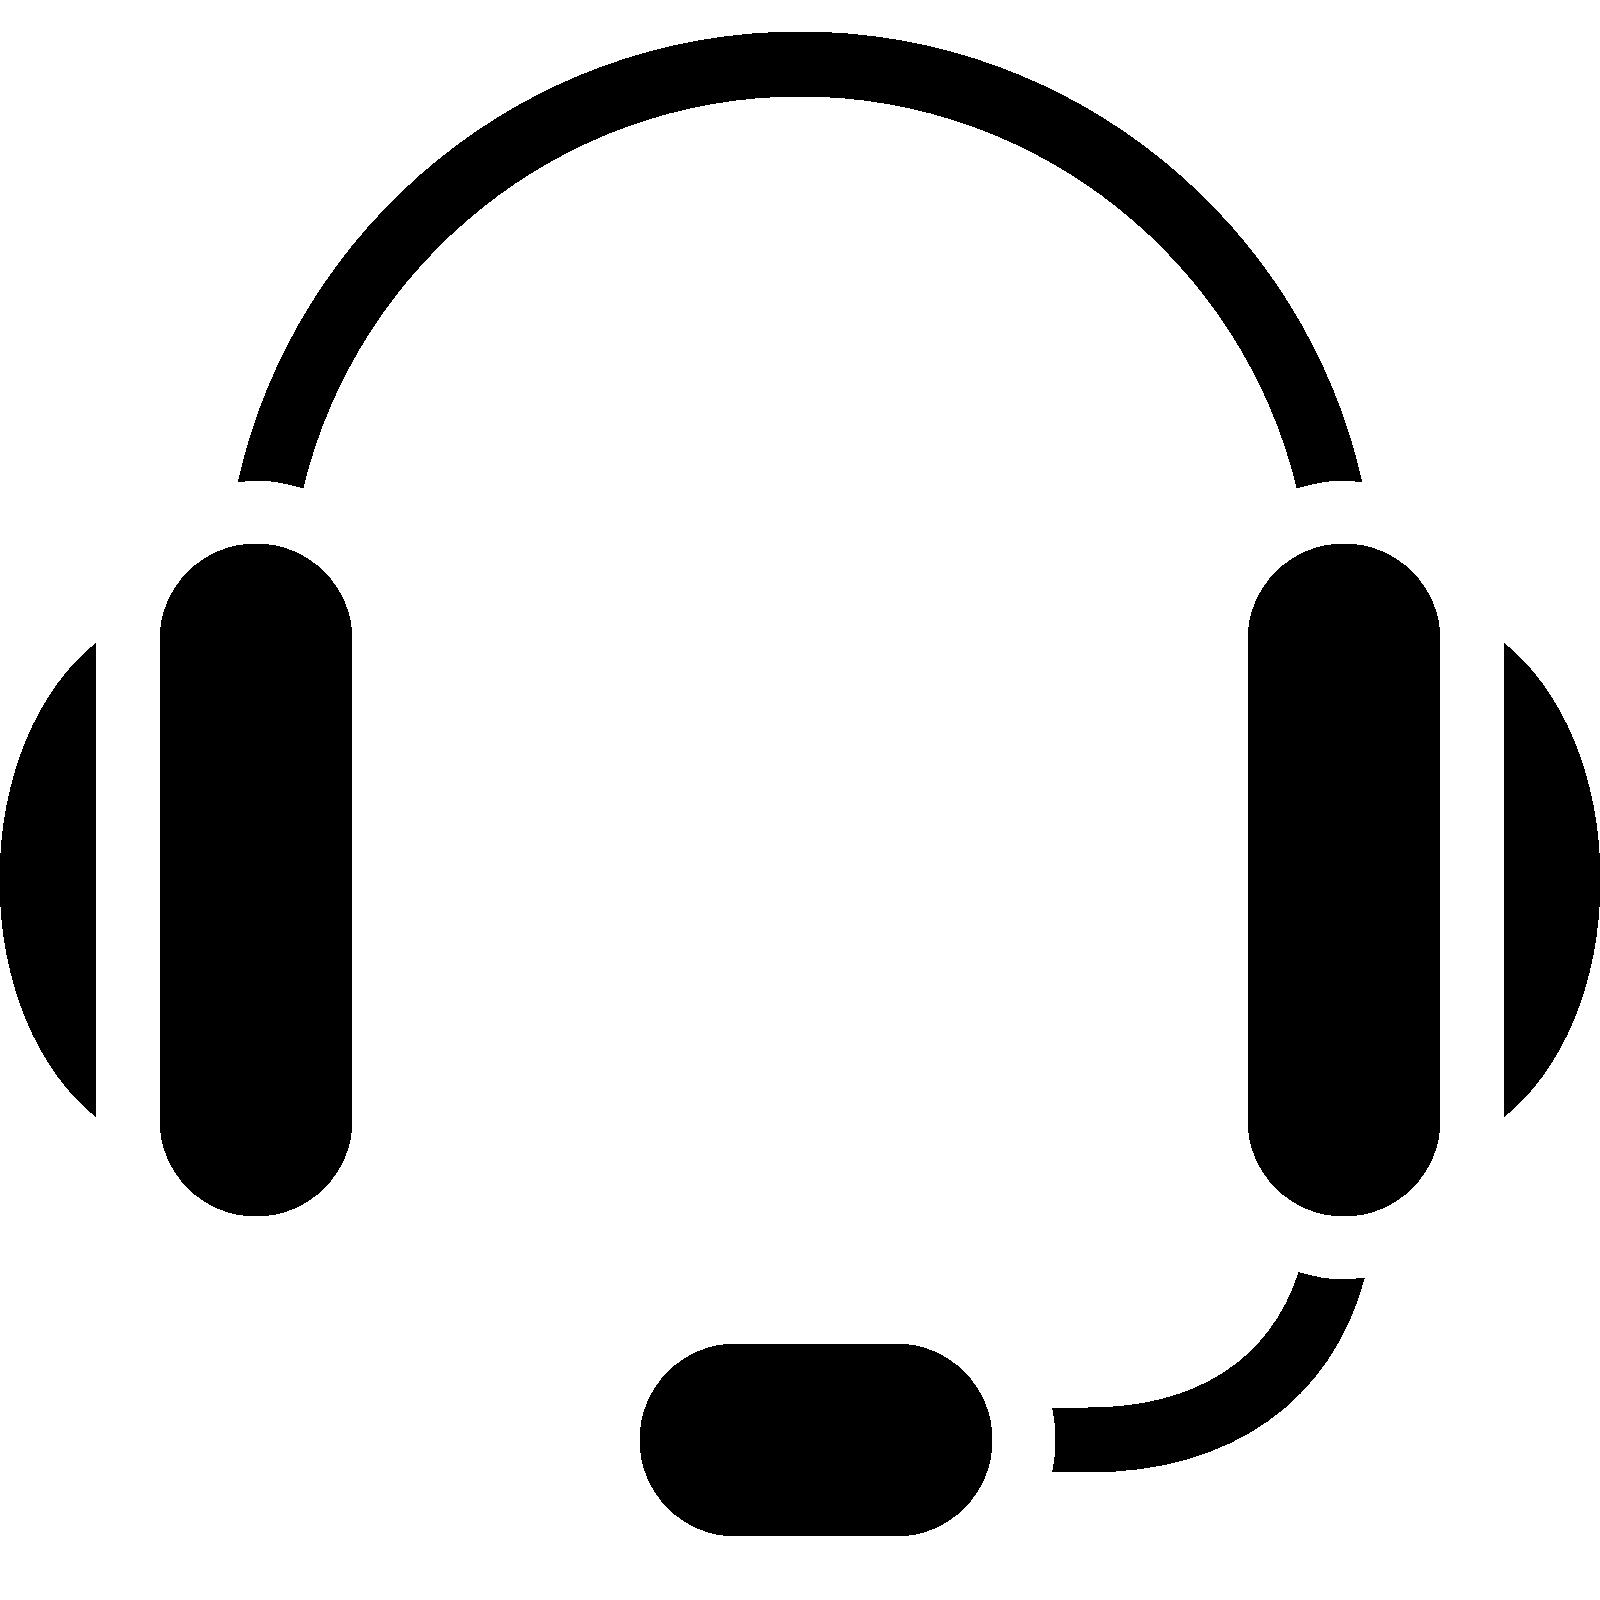 Headphone clipart gaming headset, Headphone gaming headset.